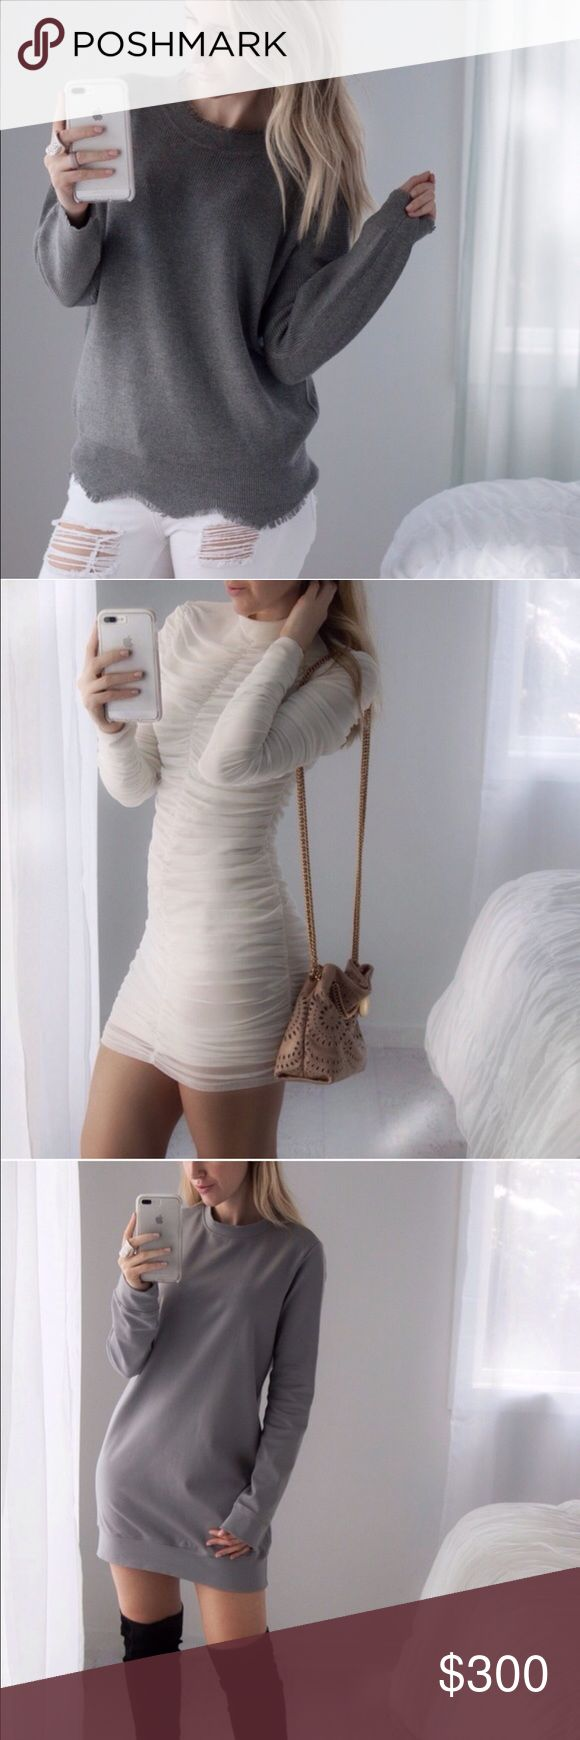 Marissa▫️3 Items Amagansett Sweater (S/M) $54, Madison Mini   Ivory (M) $55, Skyline Sweatshirt Dress   Gray (S) $49. New. Plus discount. Purchase date: 1/26. Other